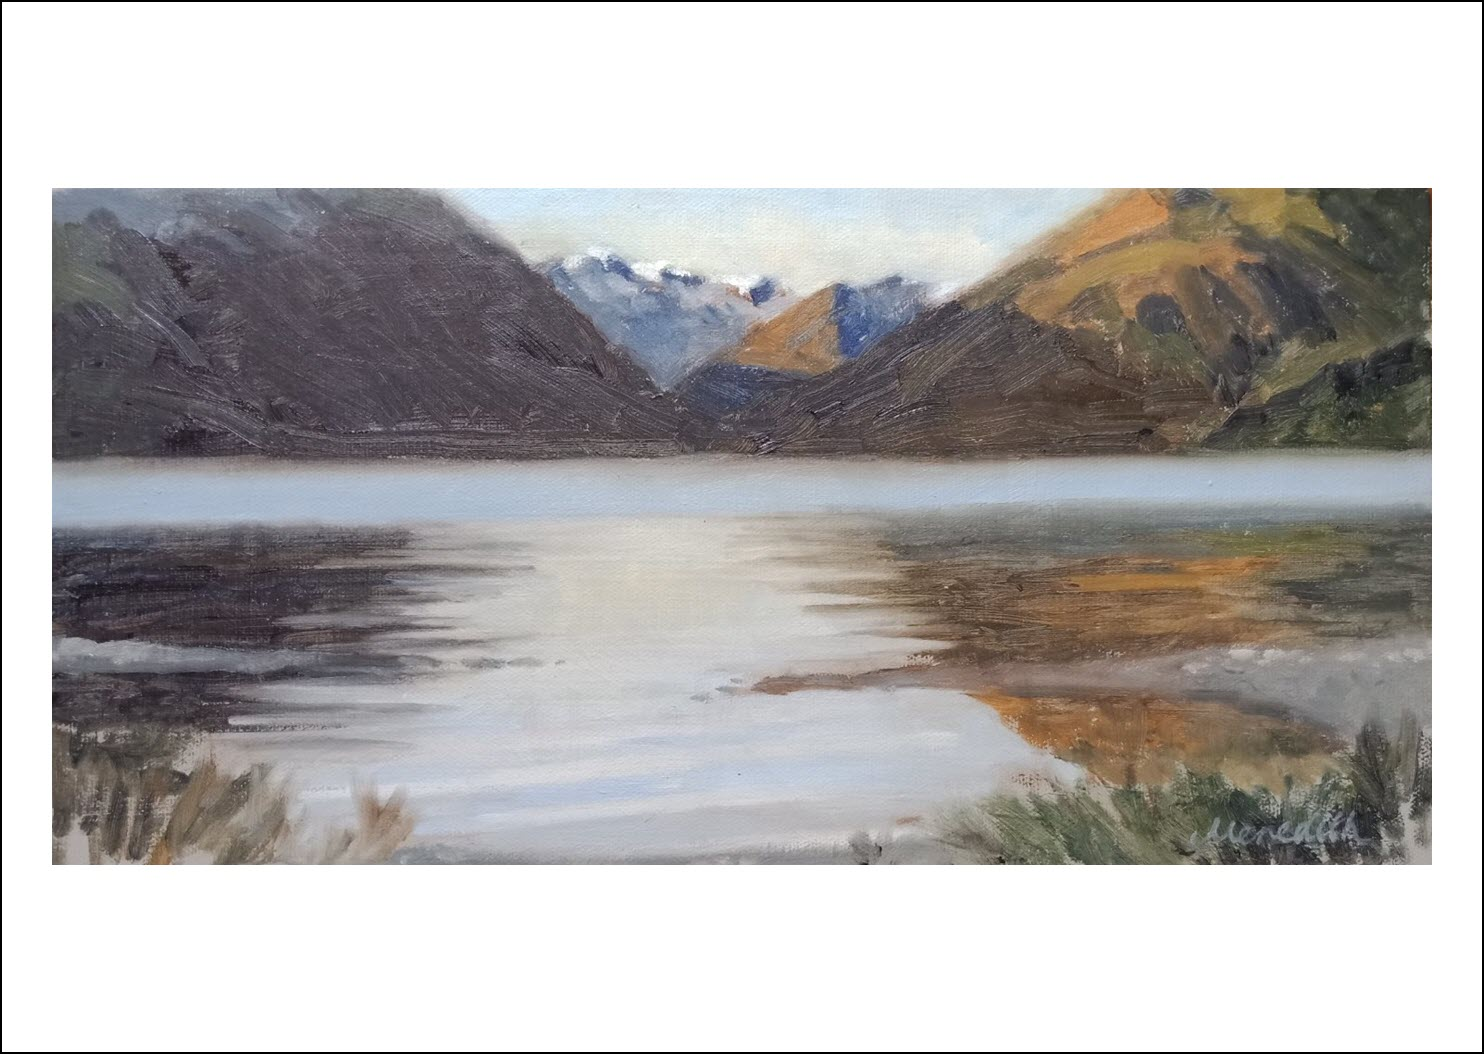 53. Lake Rotoiti Early Morning Mist